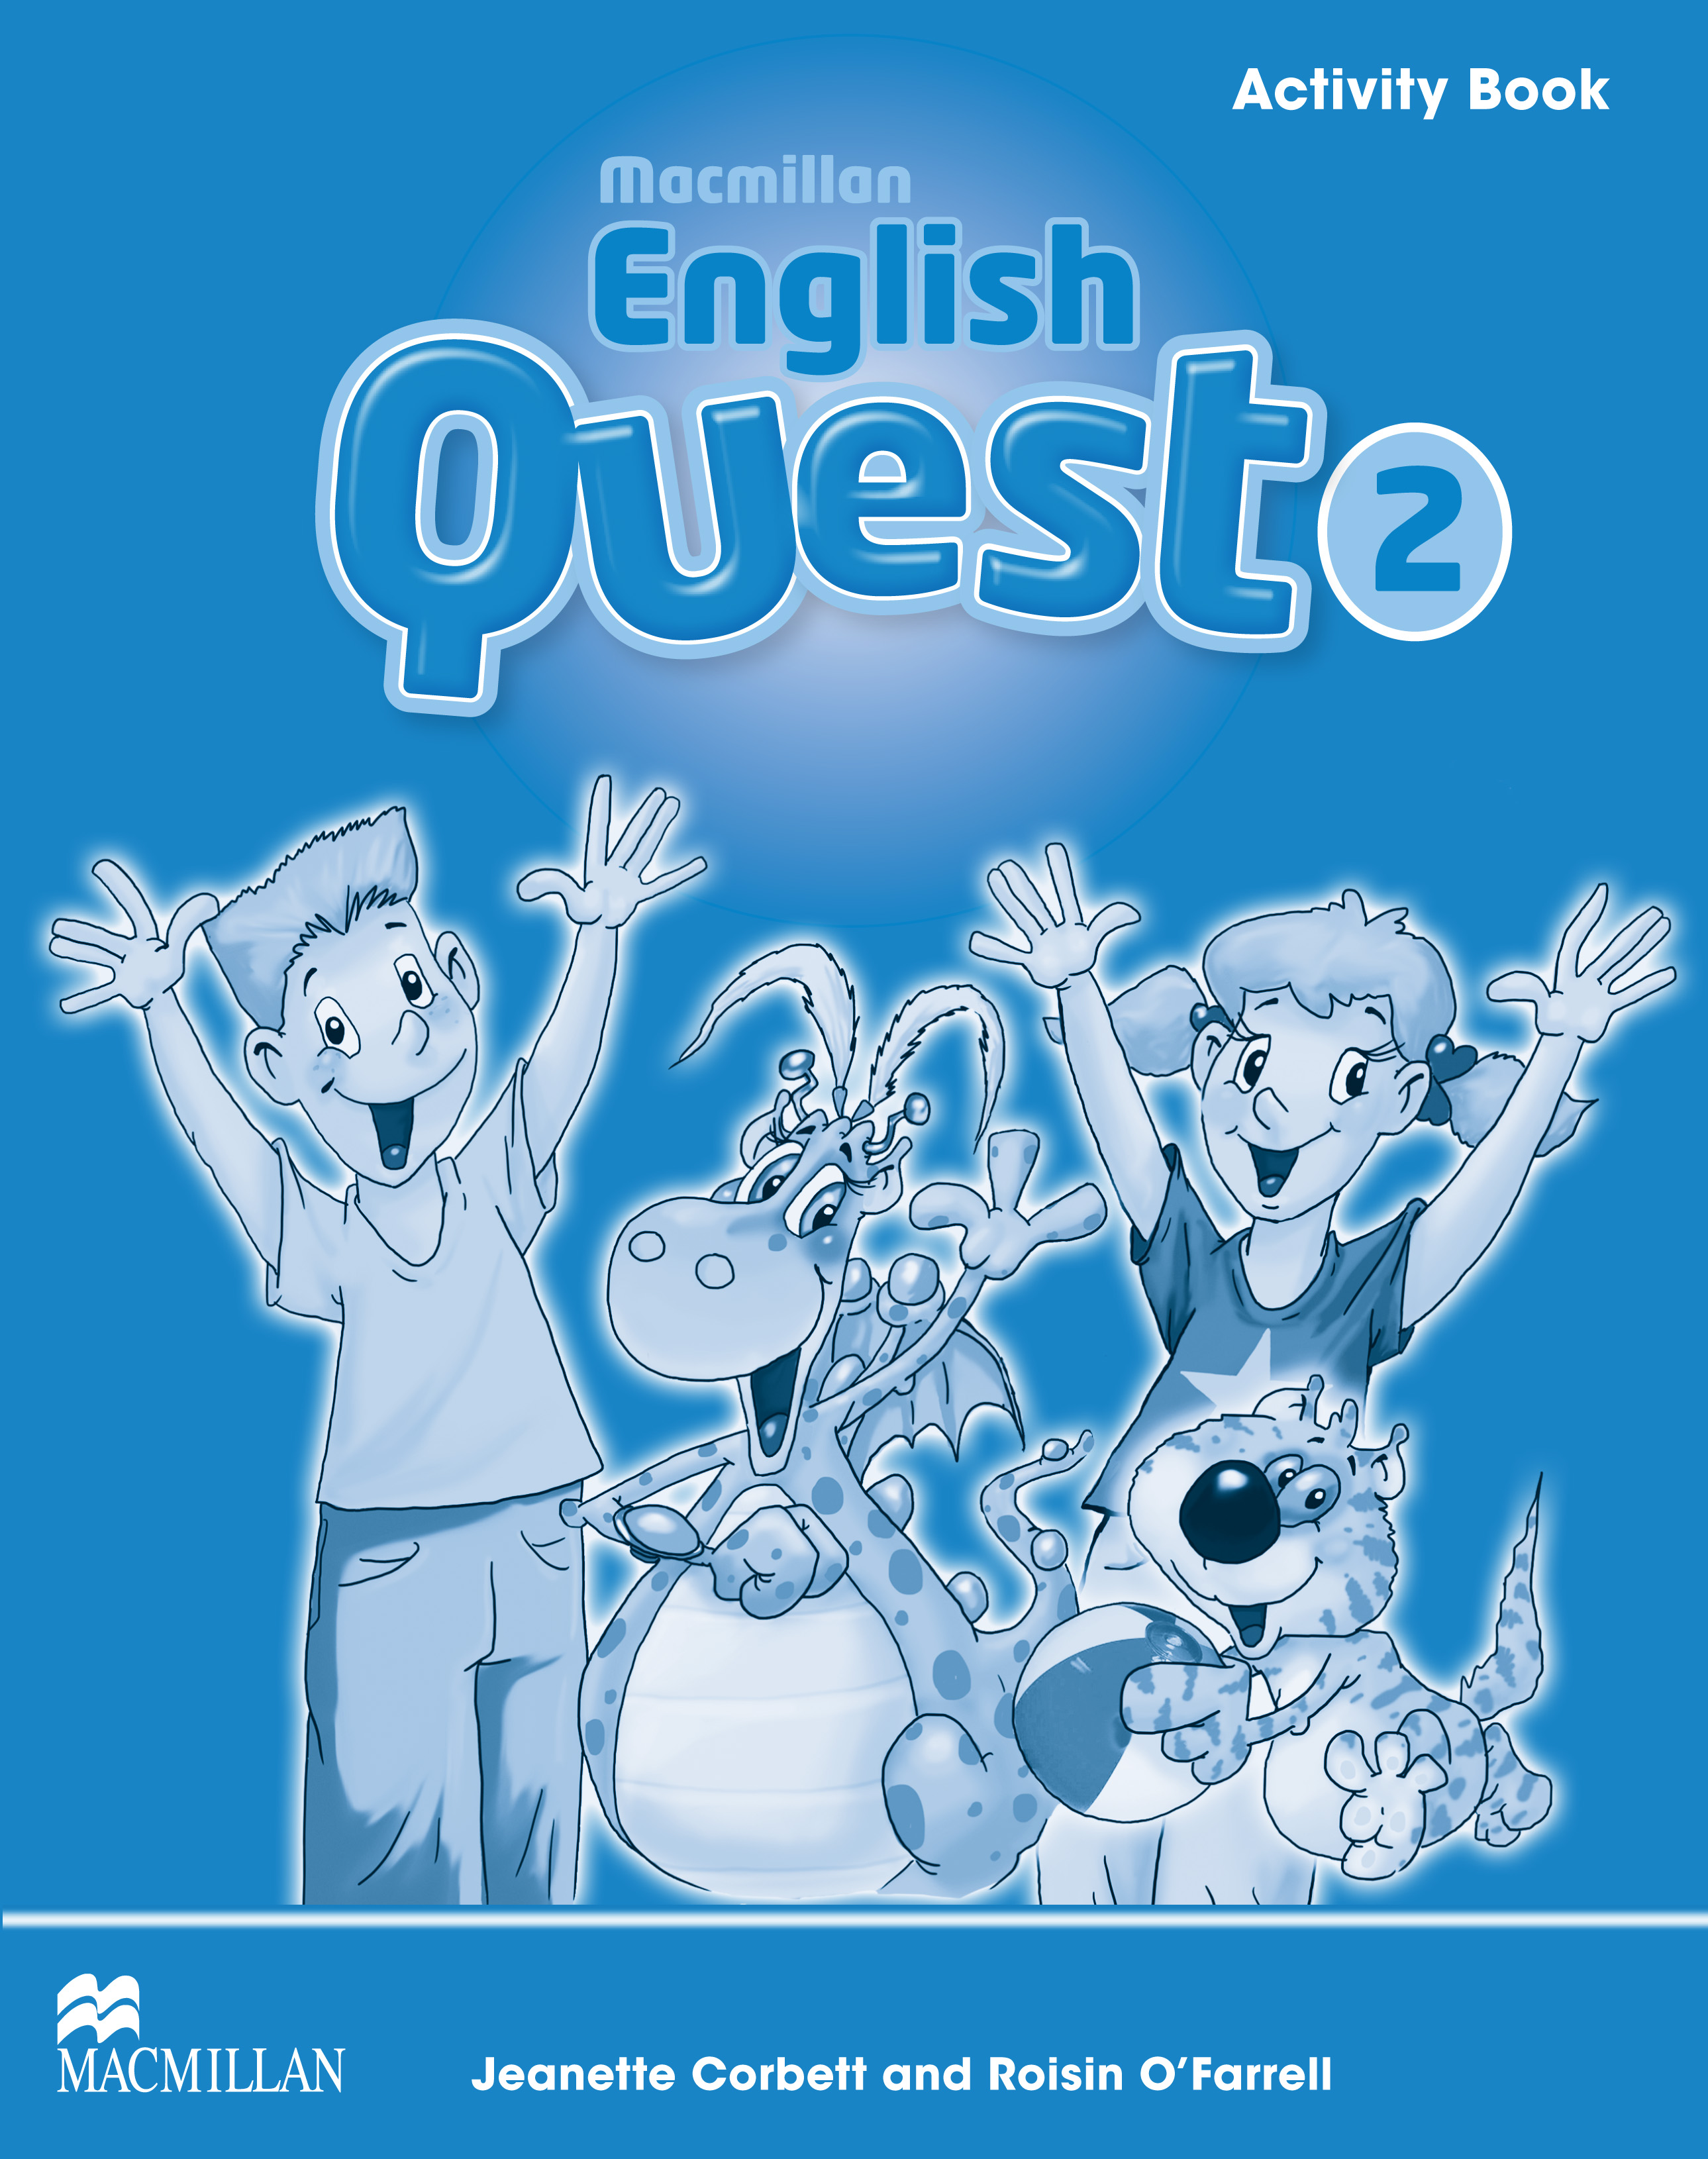 Macmillan English Quest 2 Activity Book